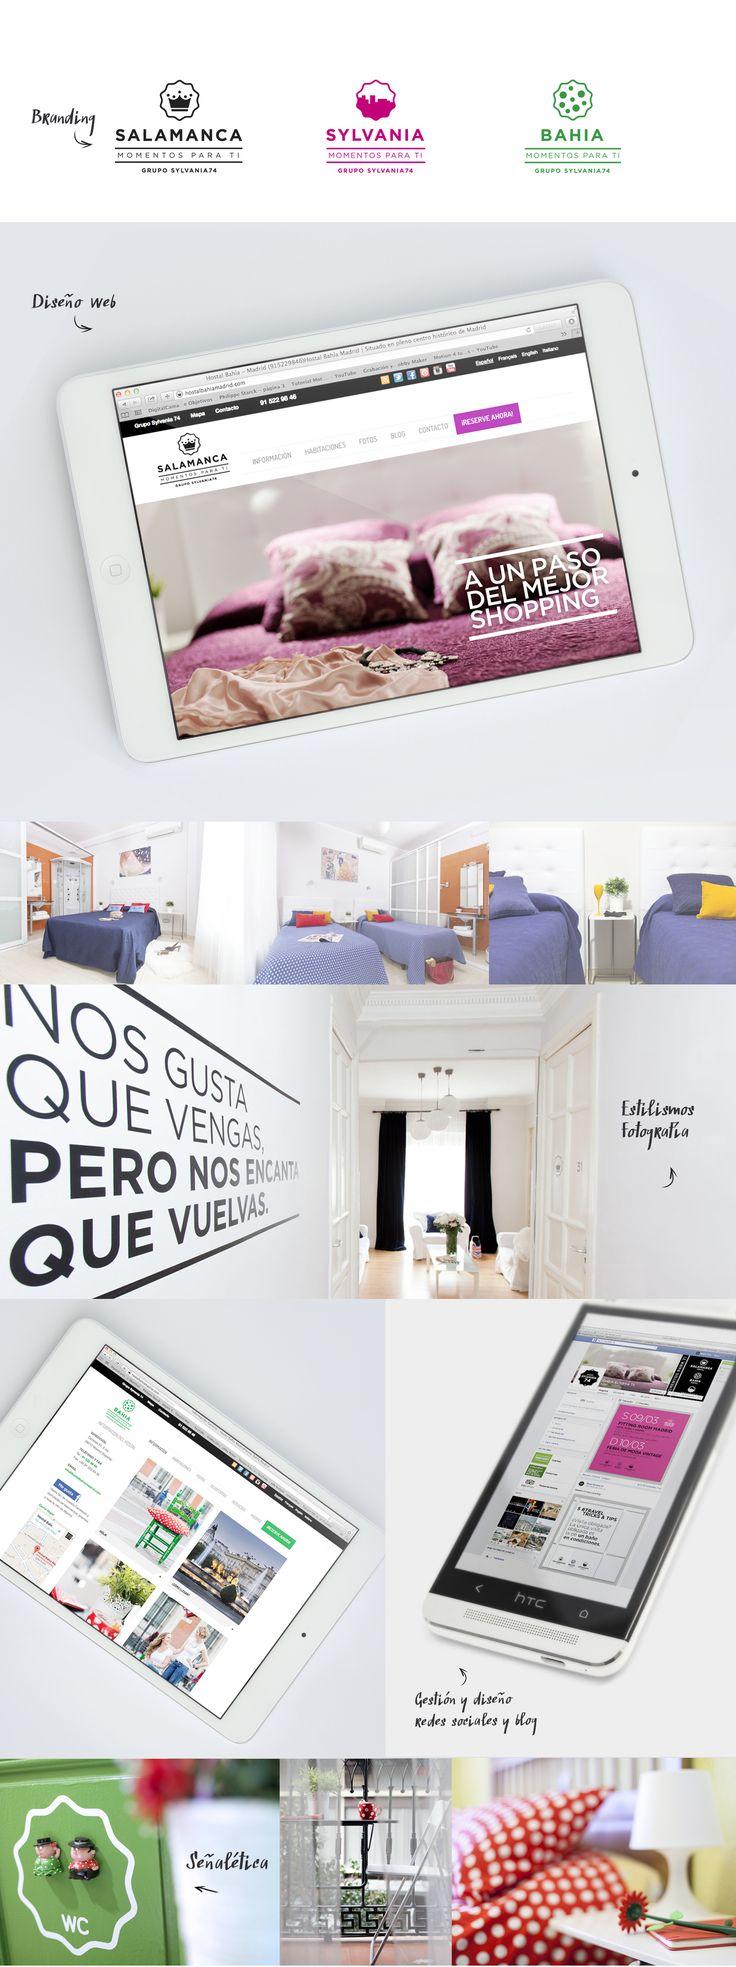 SILVANIA wannaone interiorismo branding fotografia estilismo redes sociales